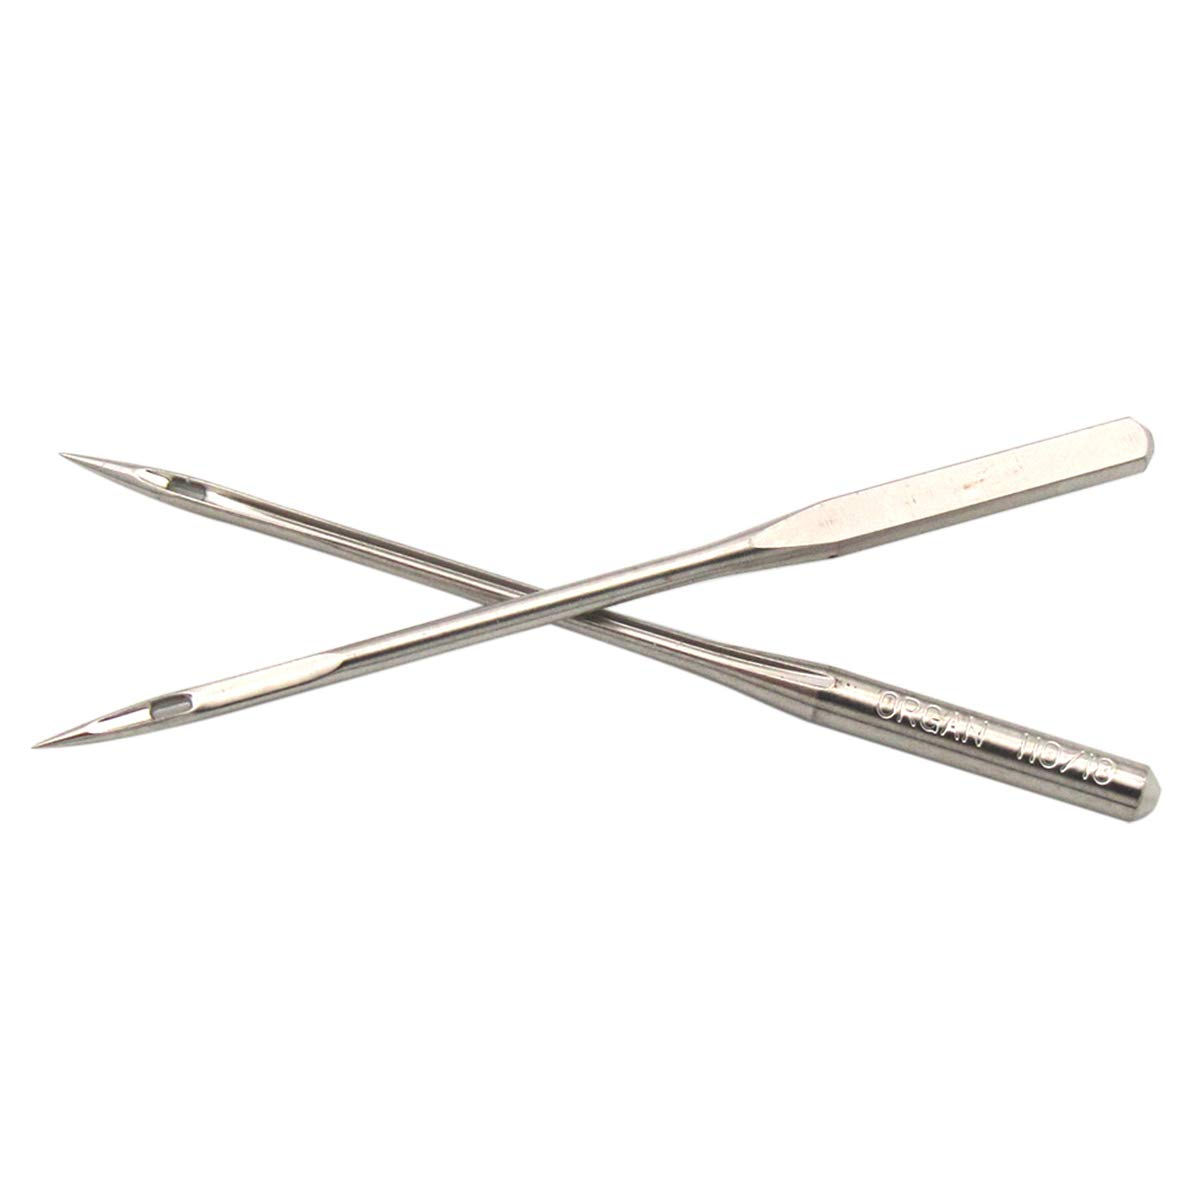 NECCHI,Brother + Pfaff JANOME RICCAR Organ Needle Organ-HAX1 Sewing Needles fit for Singer Organ-HAX1#9#11#12#14#16#18 60PCS